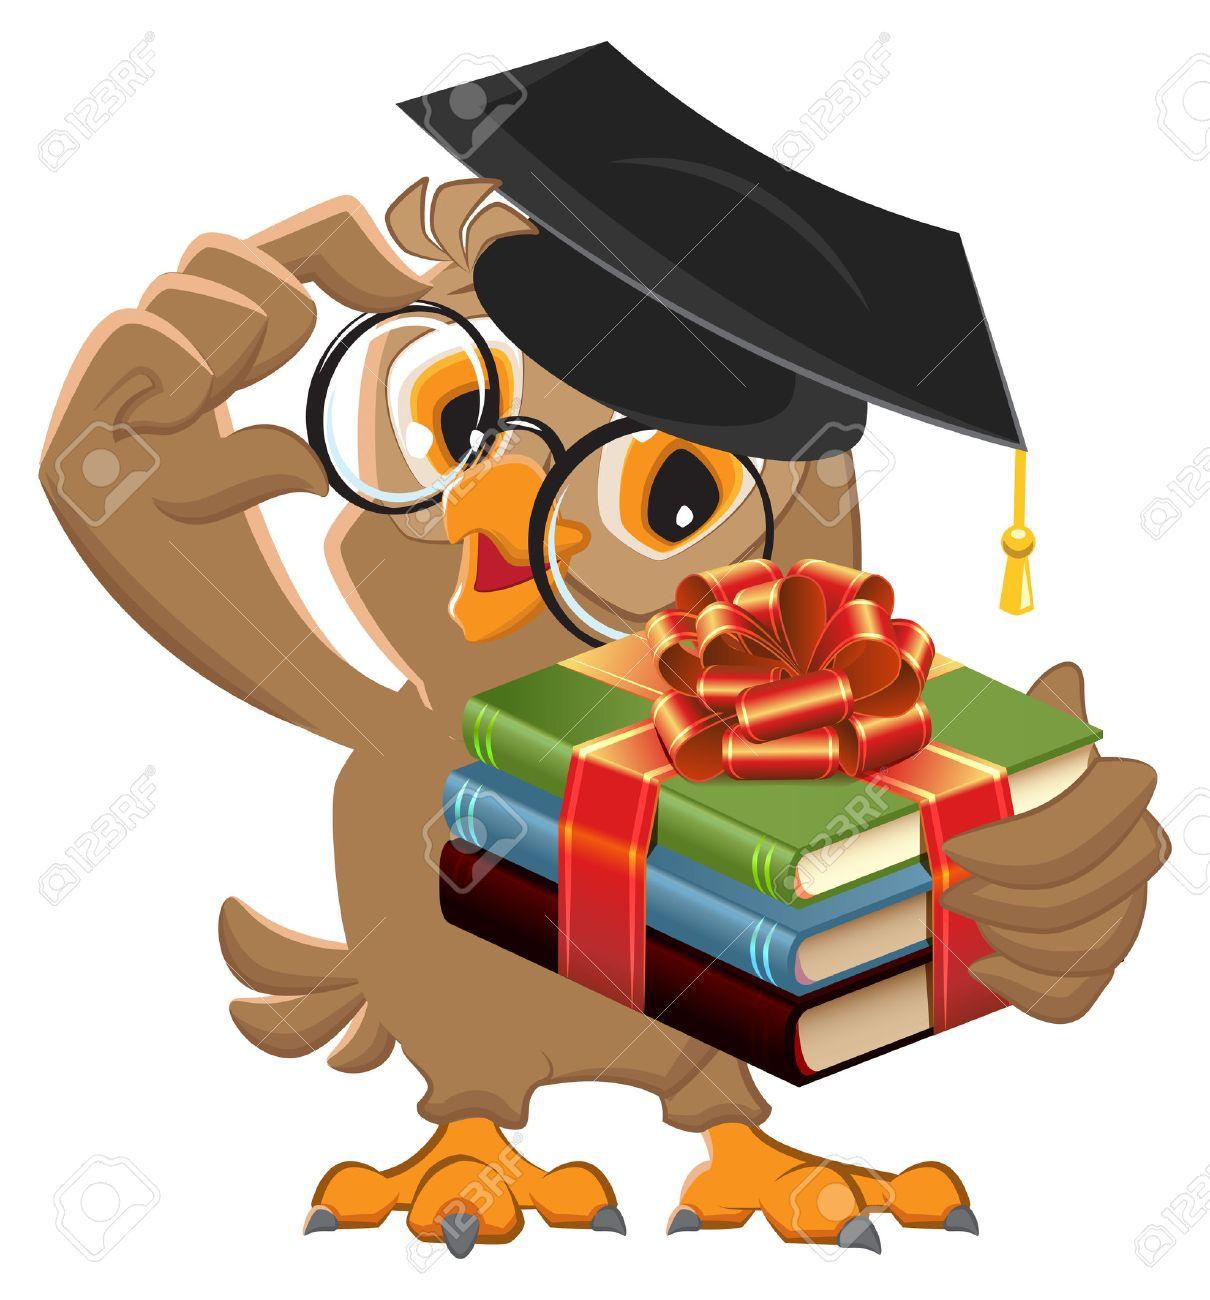 Owl teacher holding gift book. Book is best gift. cartoon illustration - 53142013